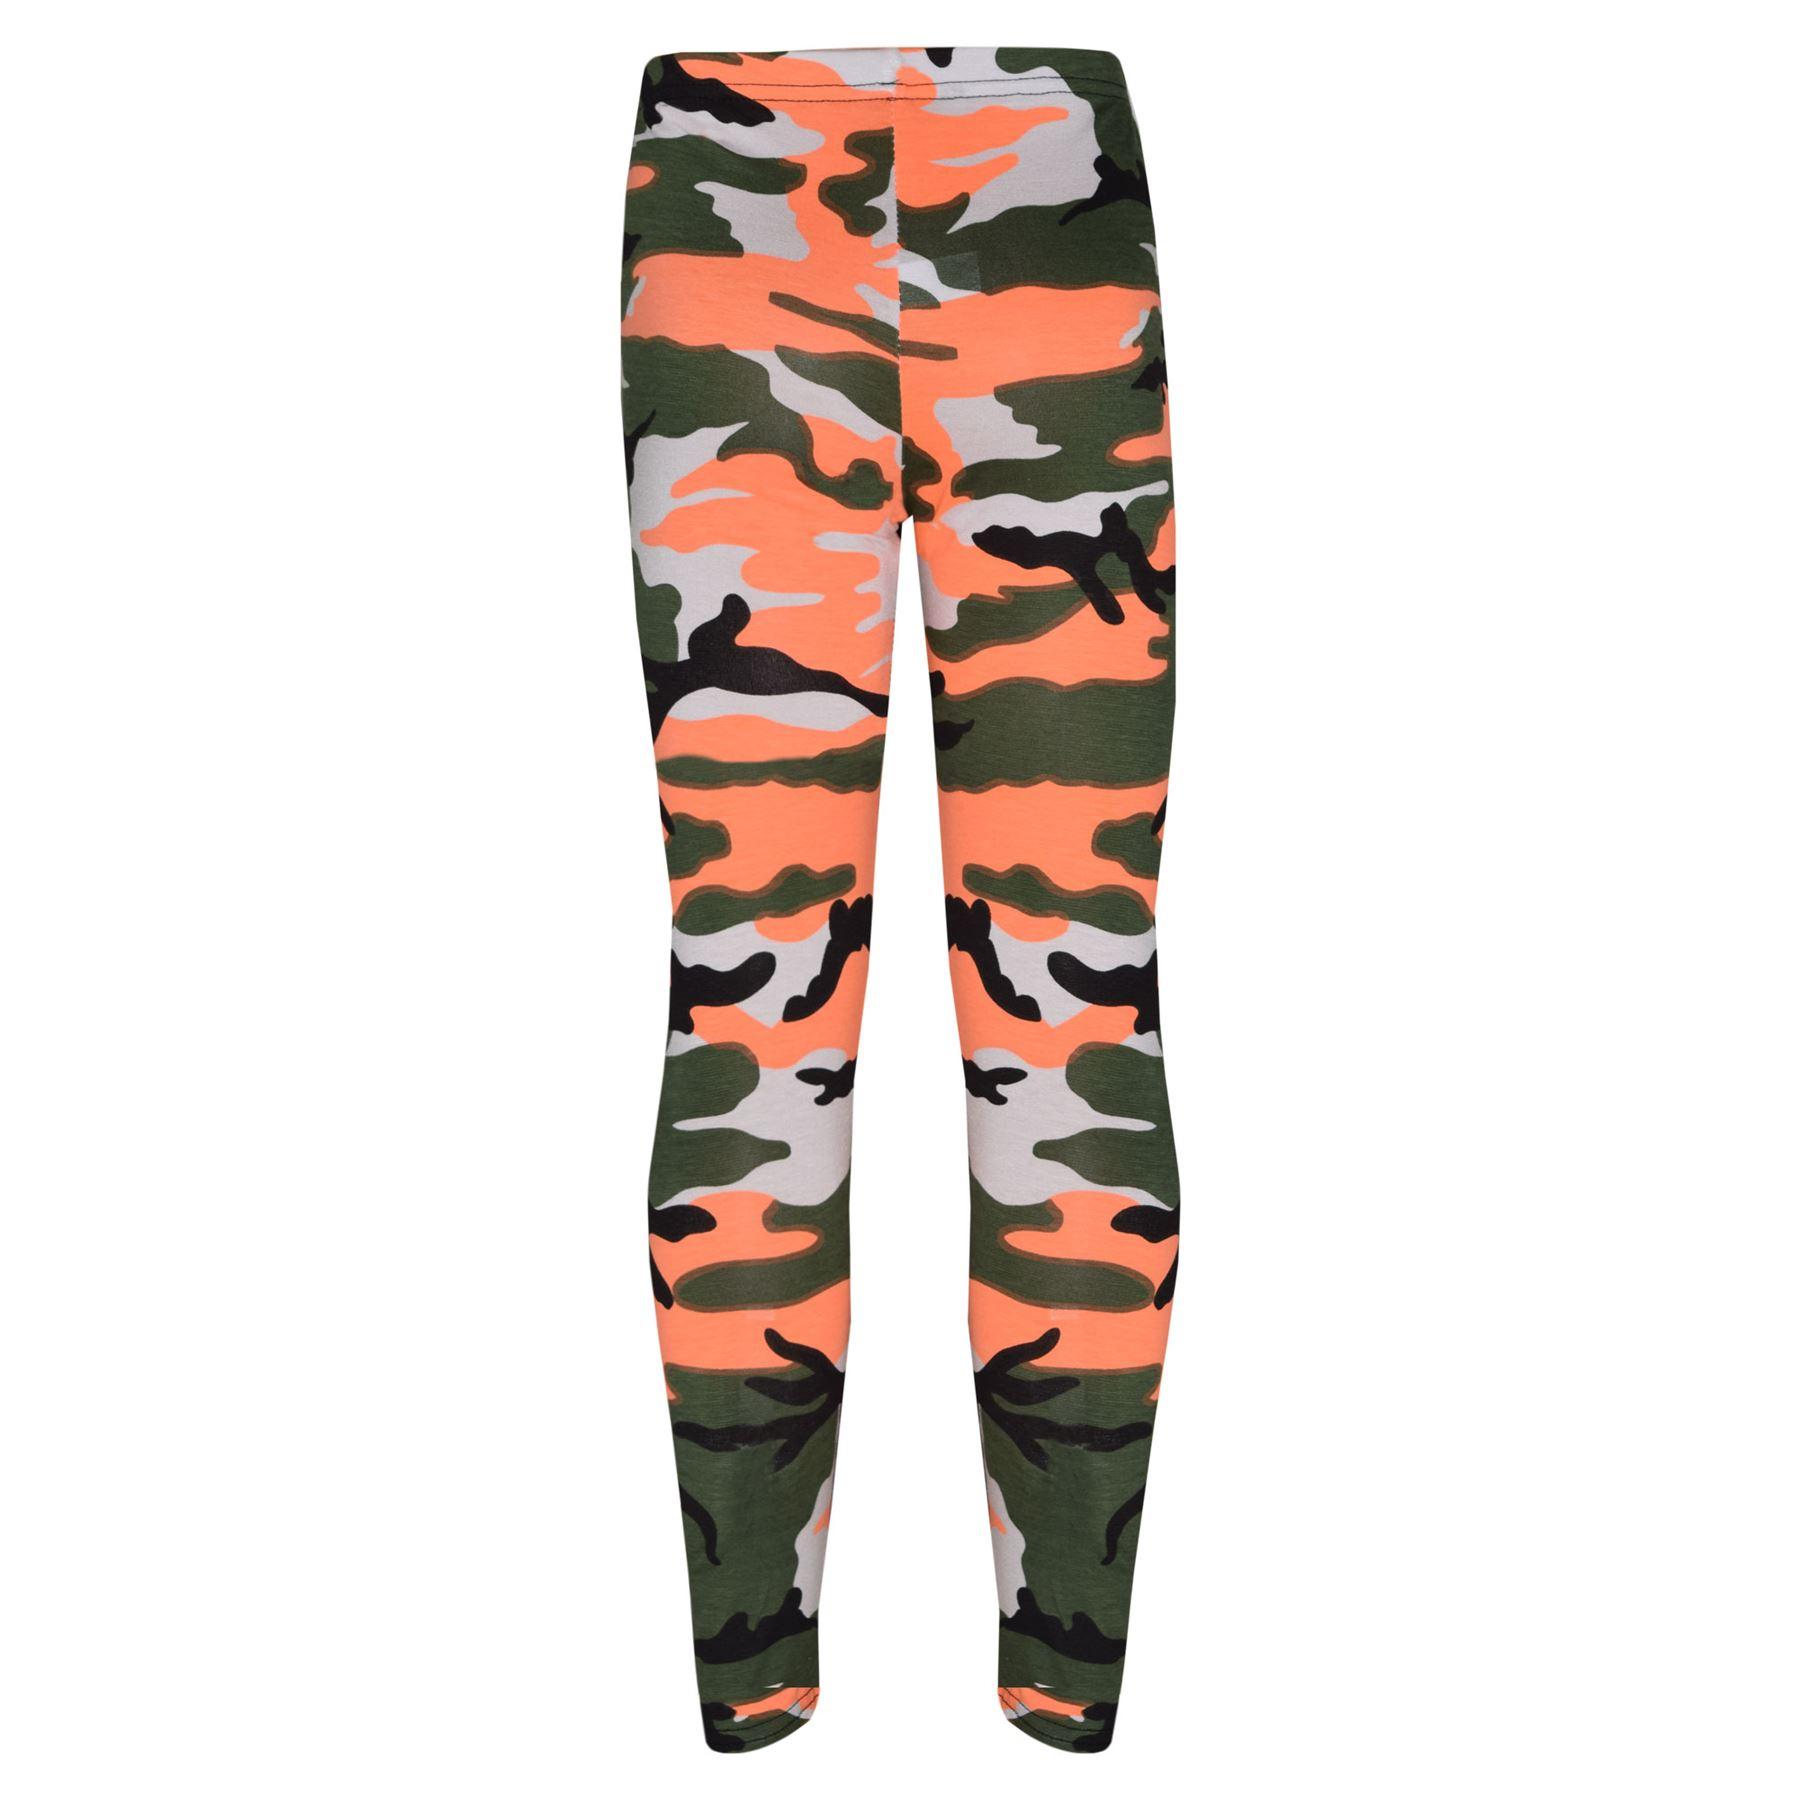 Girls-NEW-YORK-BROOKLYN-98-ATHLECTIC-Camouflage-Print-Top-amp-Legging-Set-7-13-Yr thumbnail 43